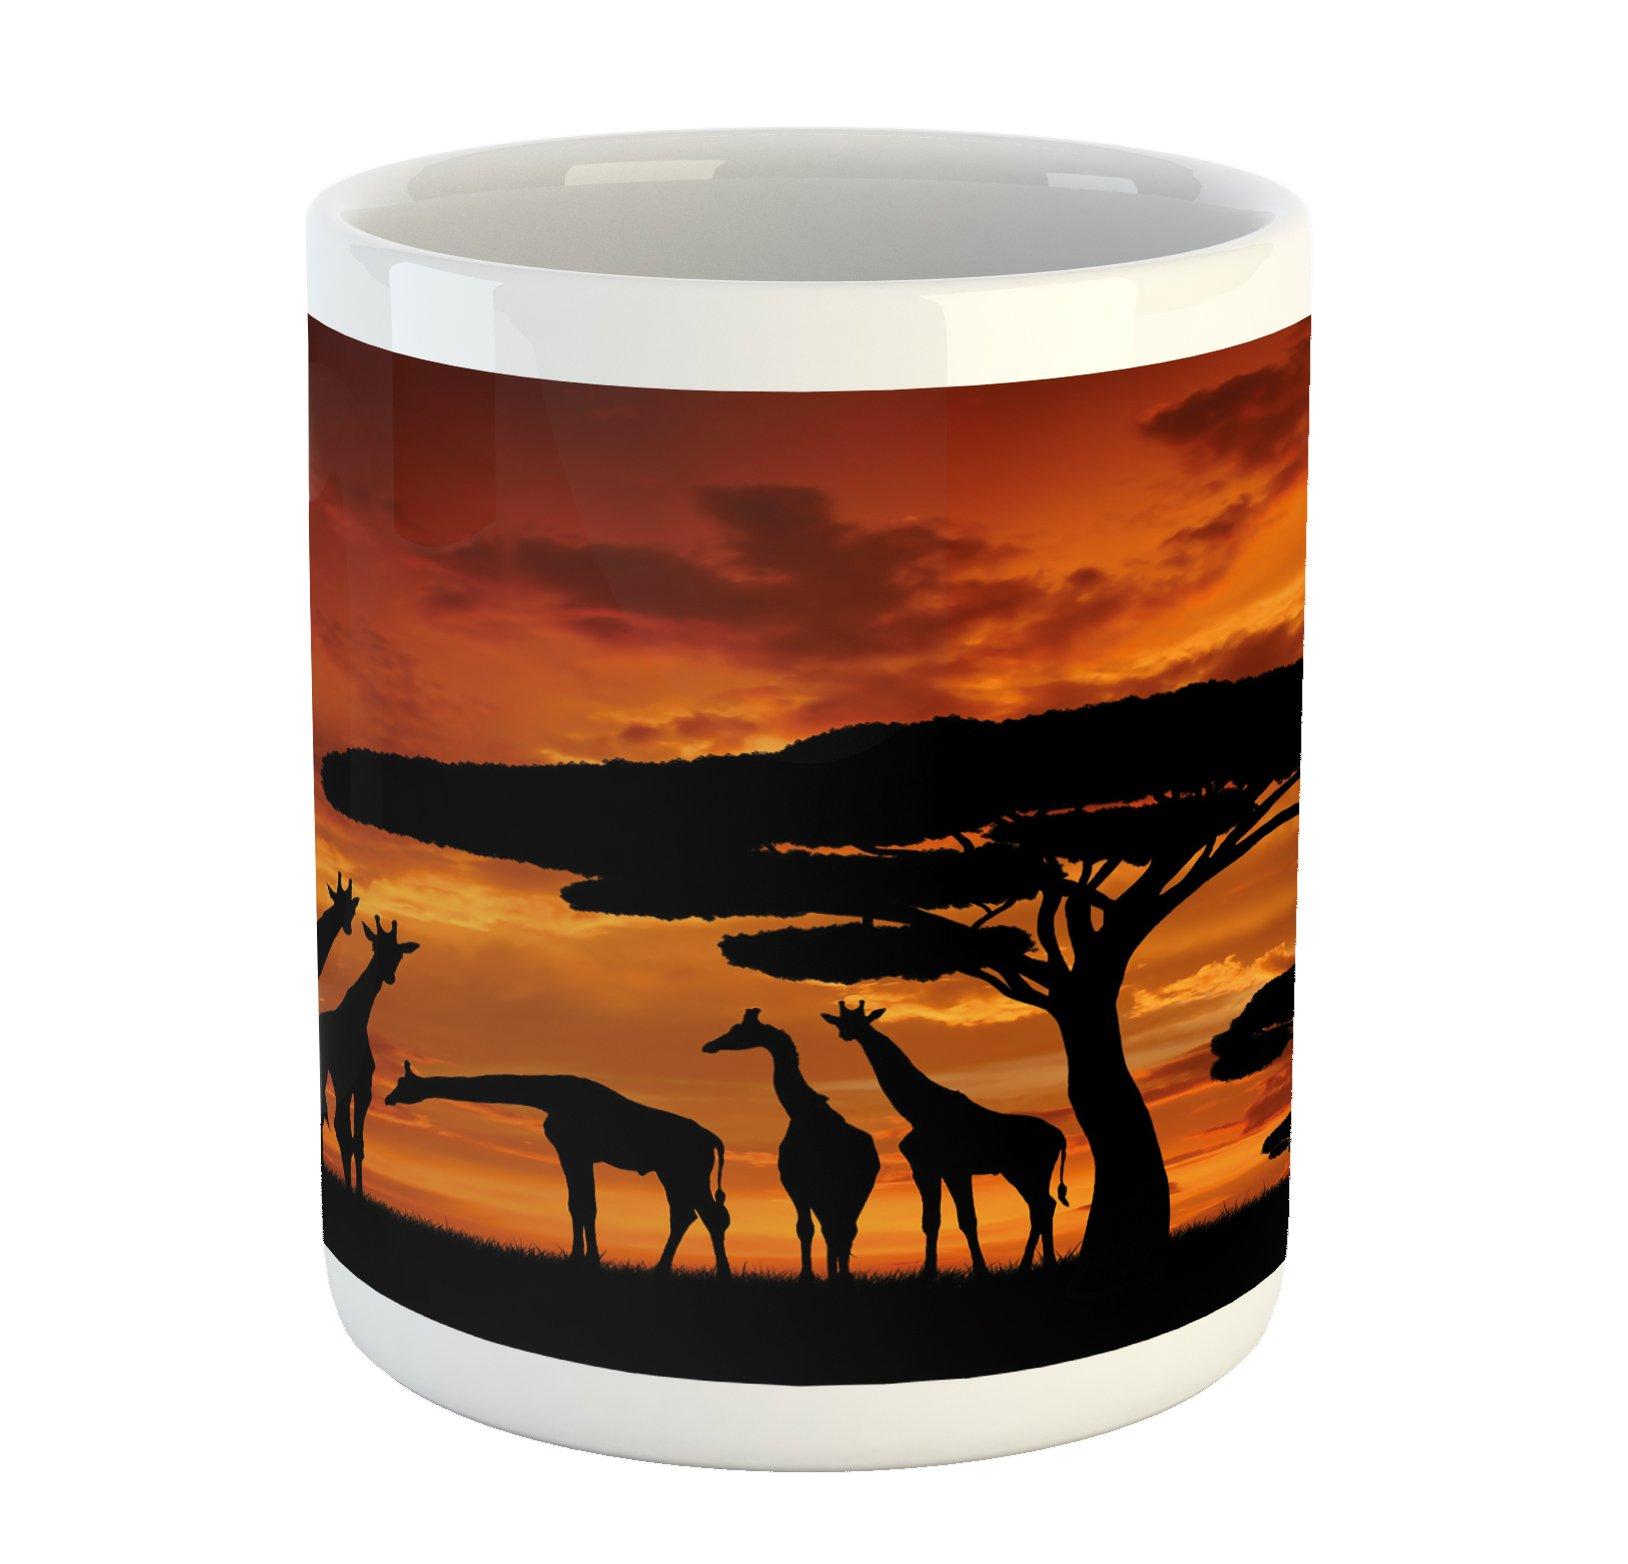 Lunarable Africa Mug, Safari Animal with Giraffe Crew with Majestic Tree at Sunrise in Kenya, Printed Ceramic Coffee Mug Water Tea Drinks Cup, Burnt Orange and Black